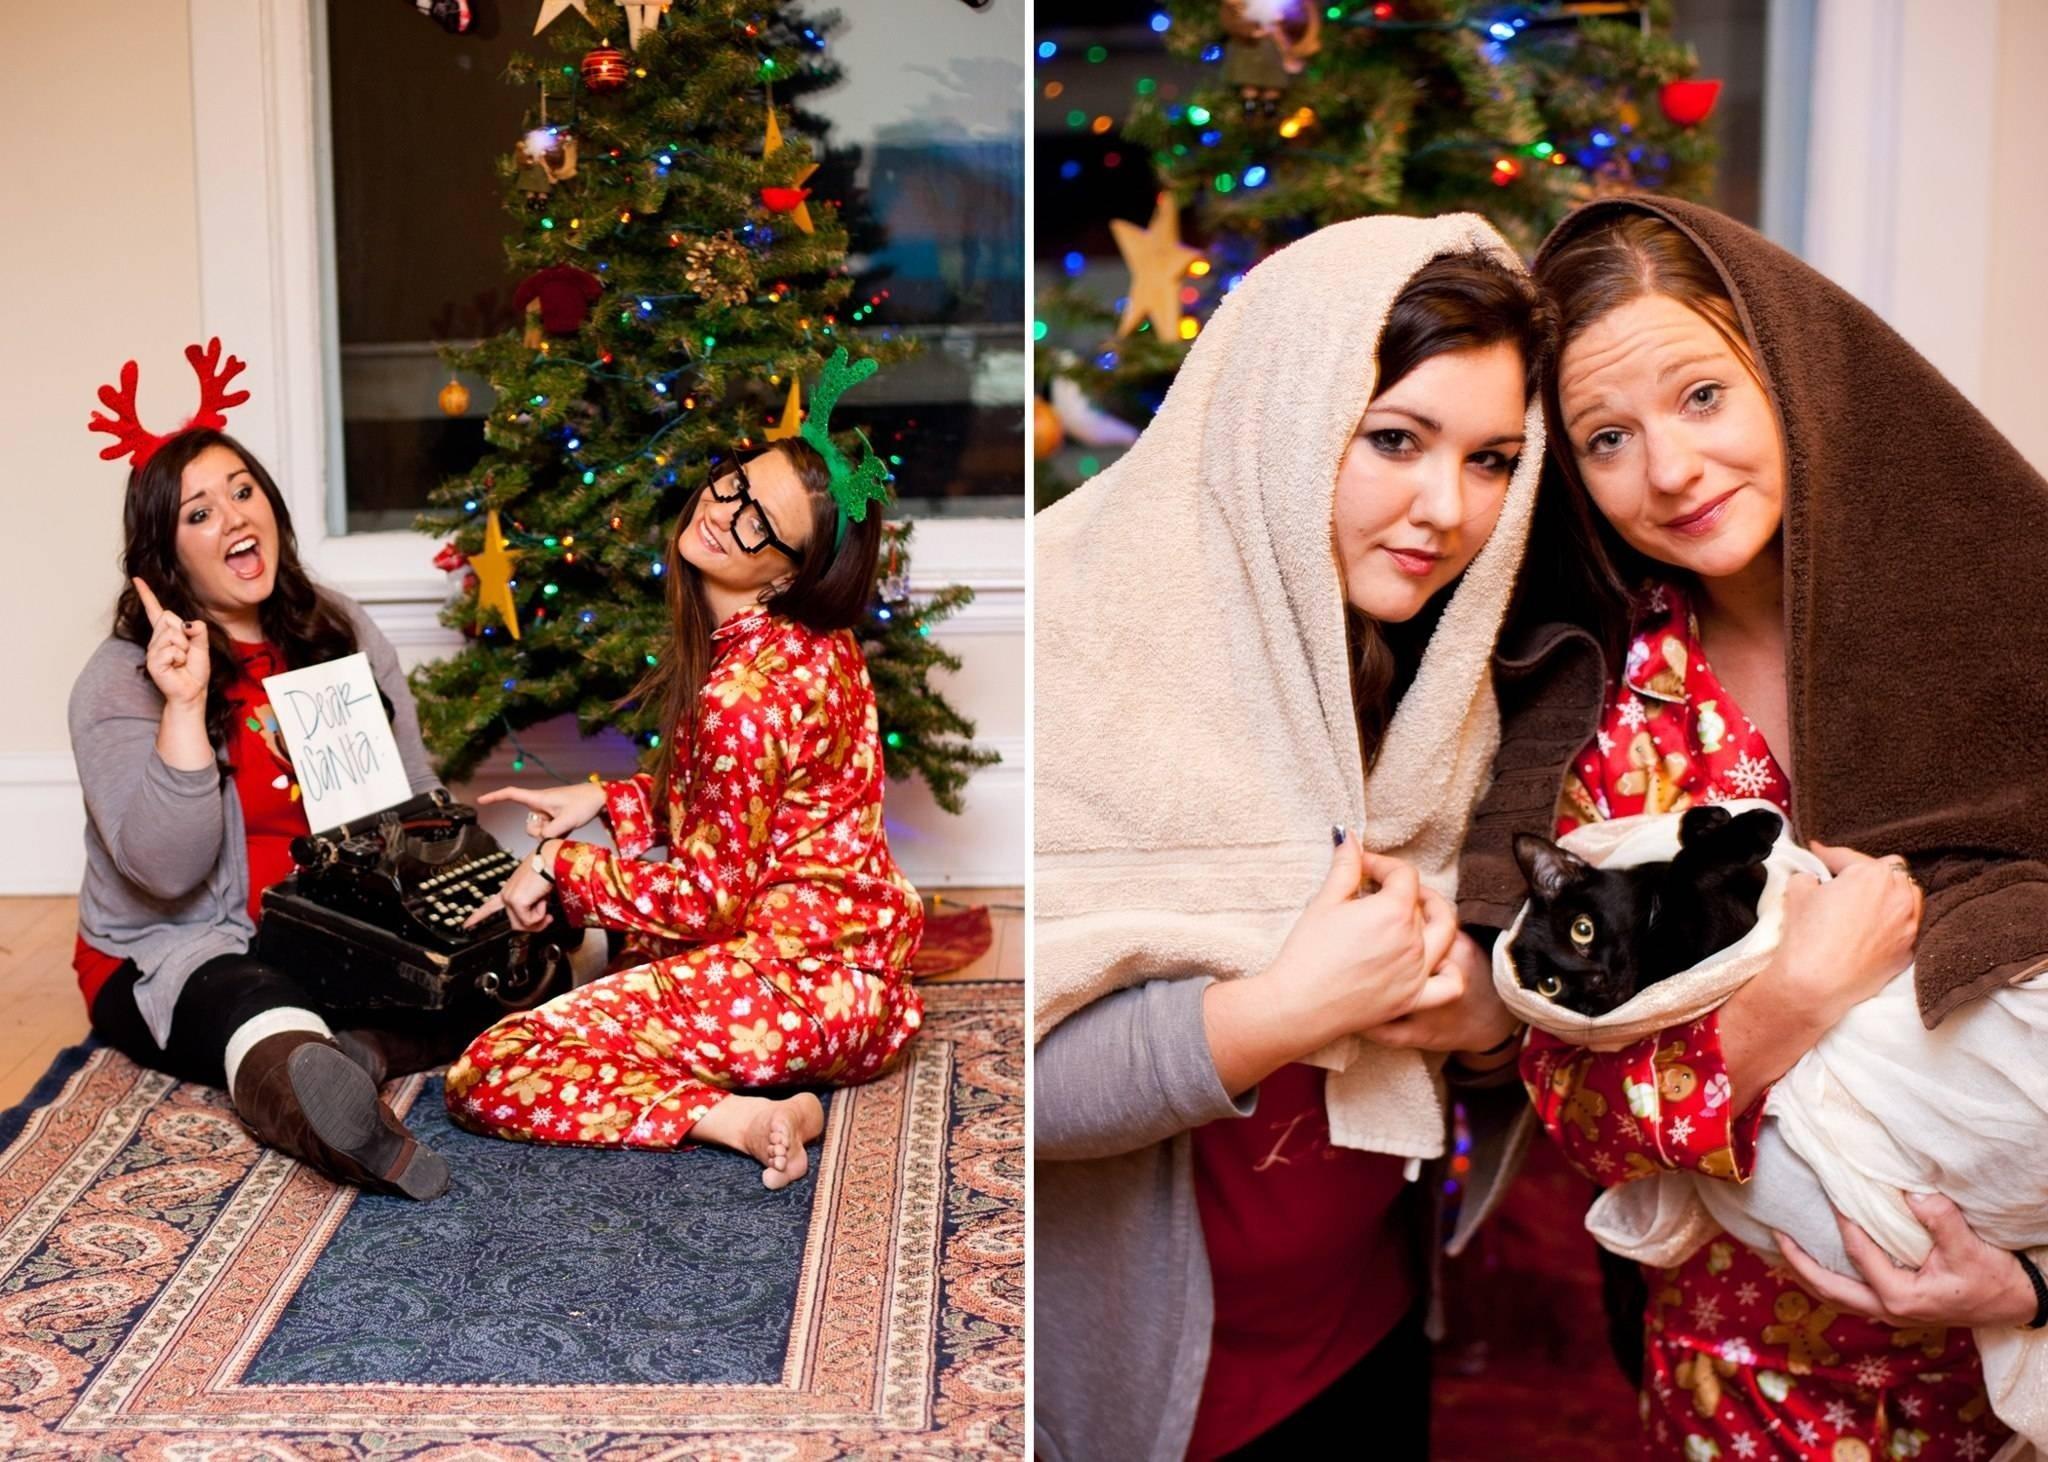 10 Fashionable Cute Christmas Card Photo Ideas funny homemade christmas cards huffington post tierra este 17145 2 2020